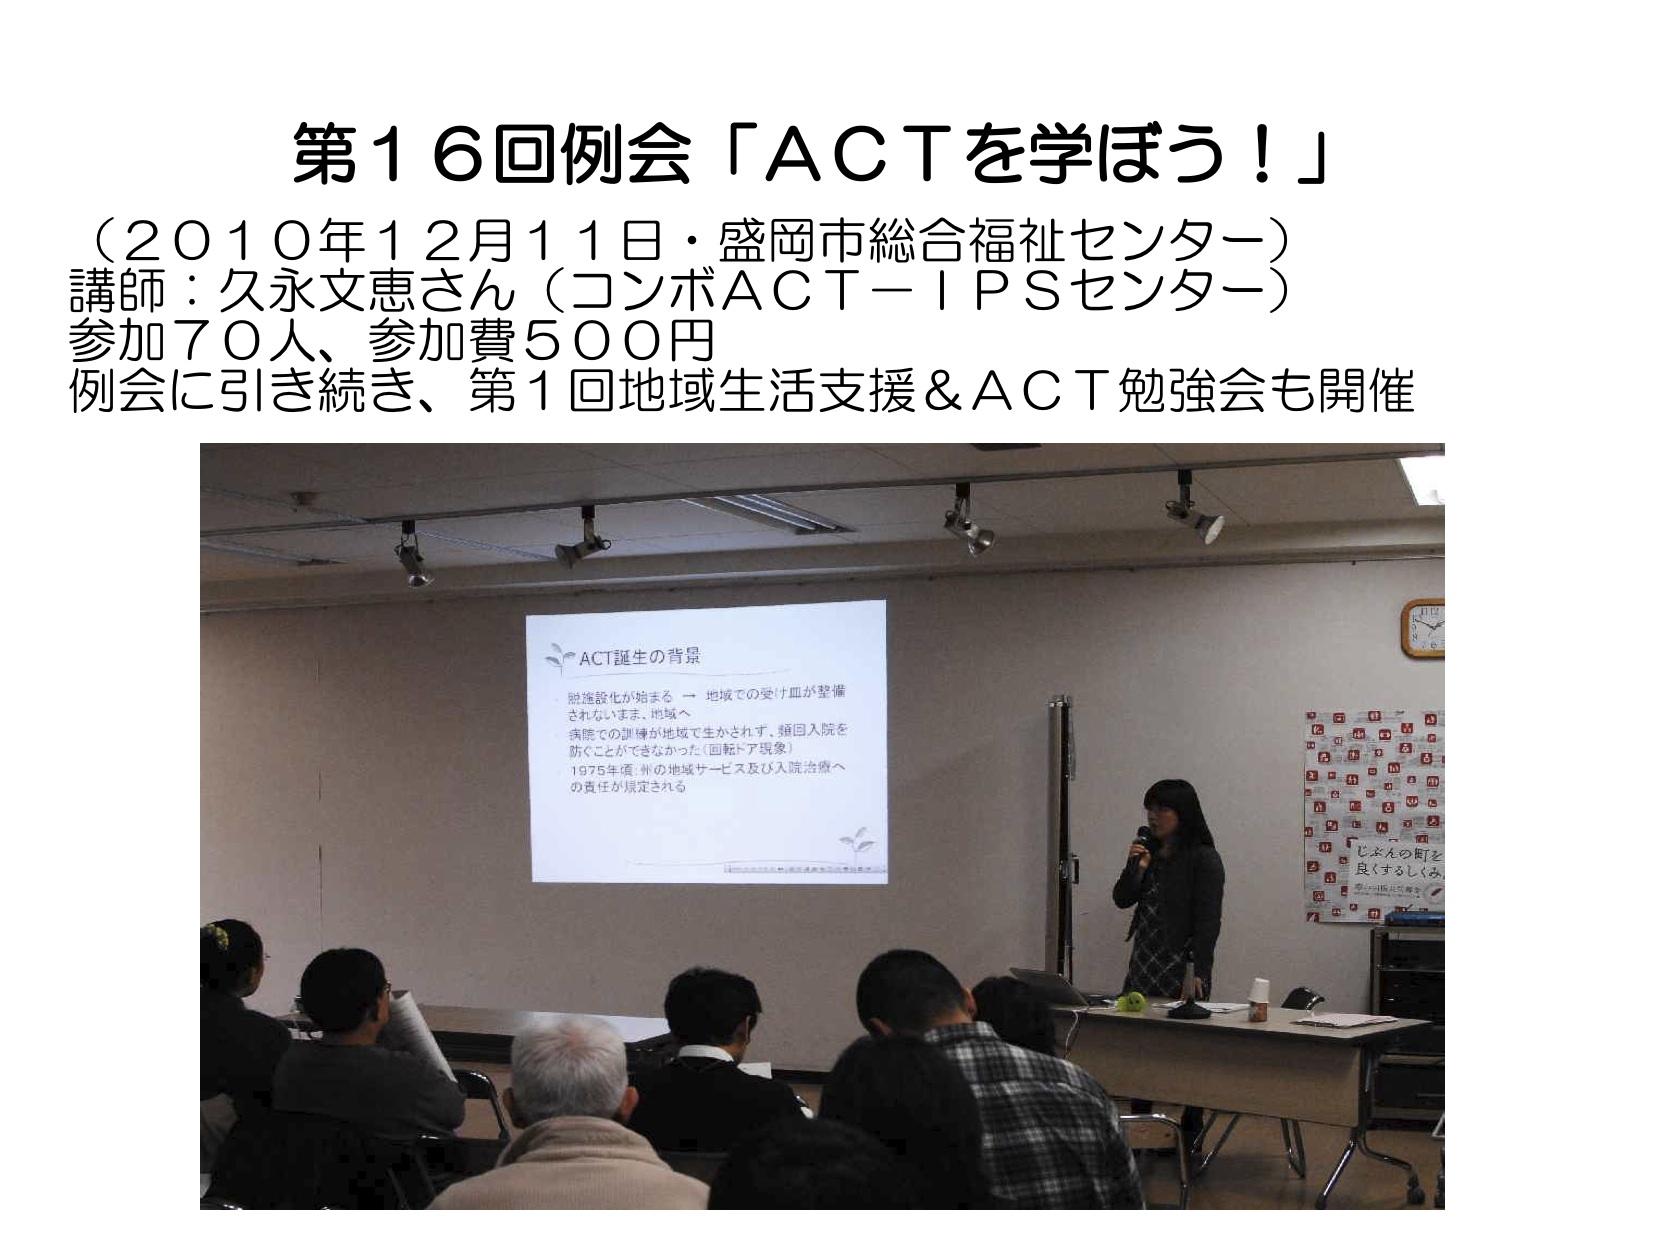 PS養成講座…パワーポイント資料④_a0103650_20485279.jpg